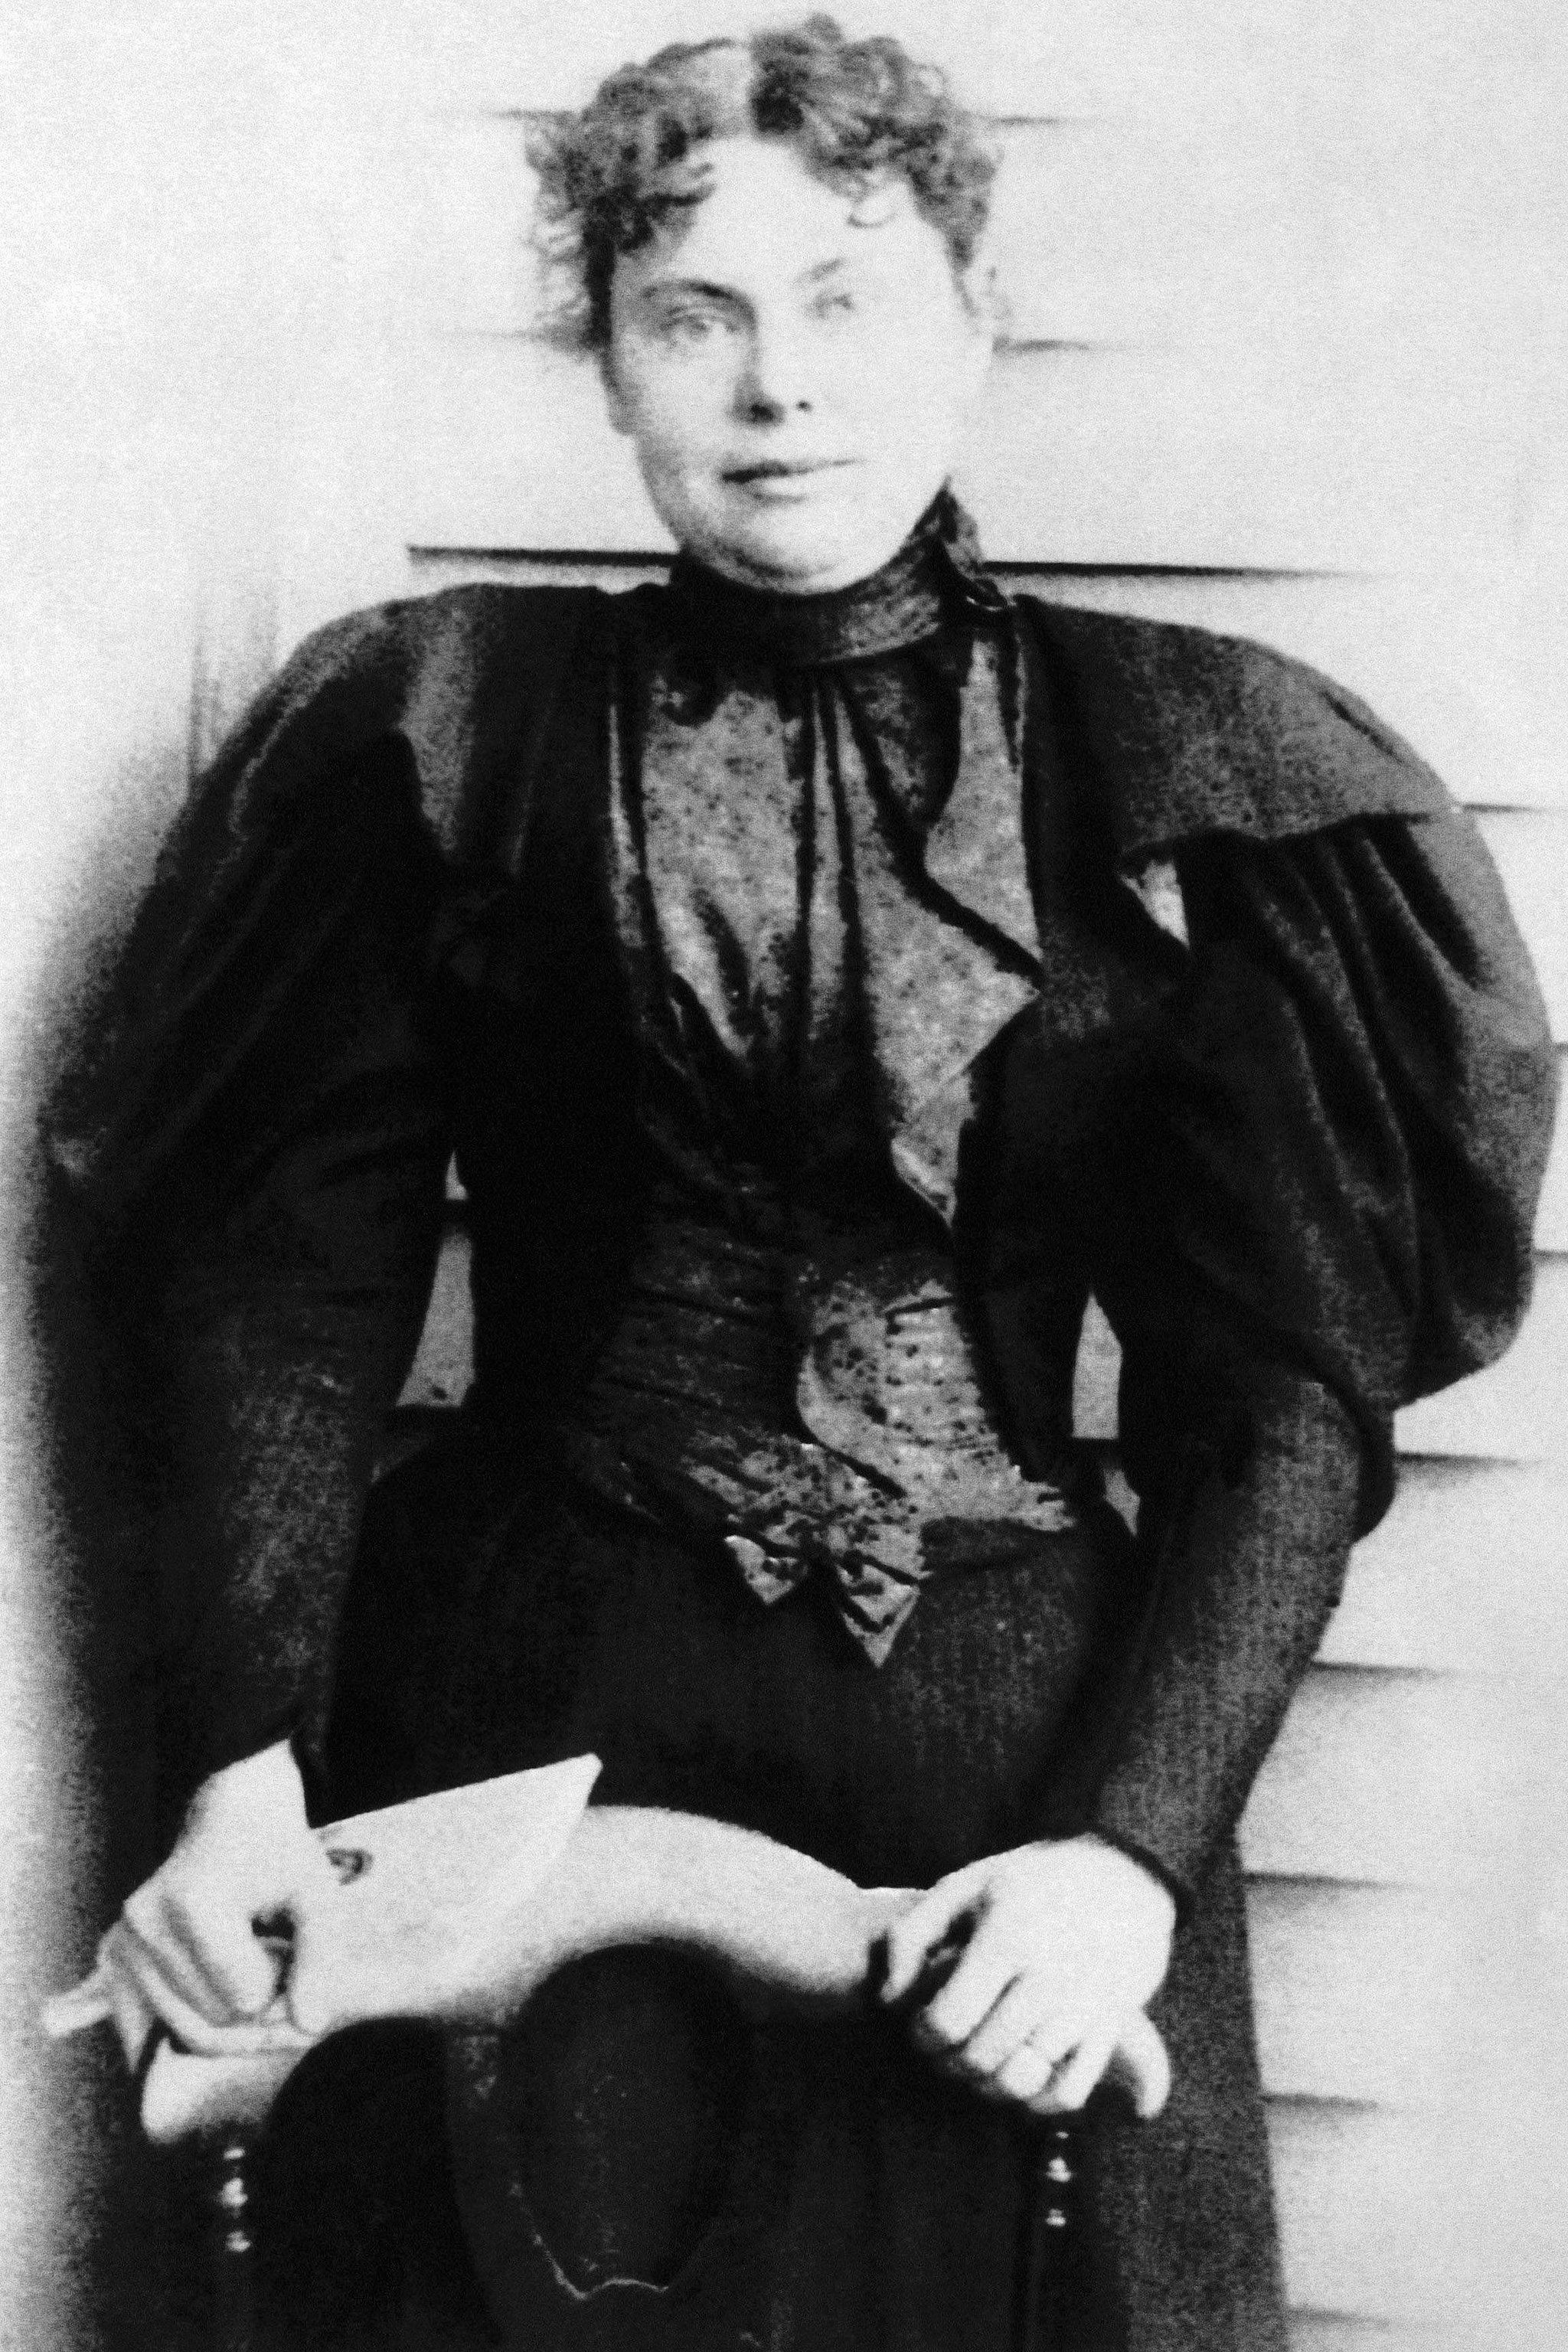 pics Lizzy Borden (actress)